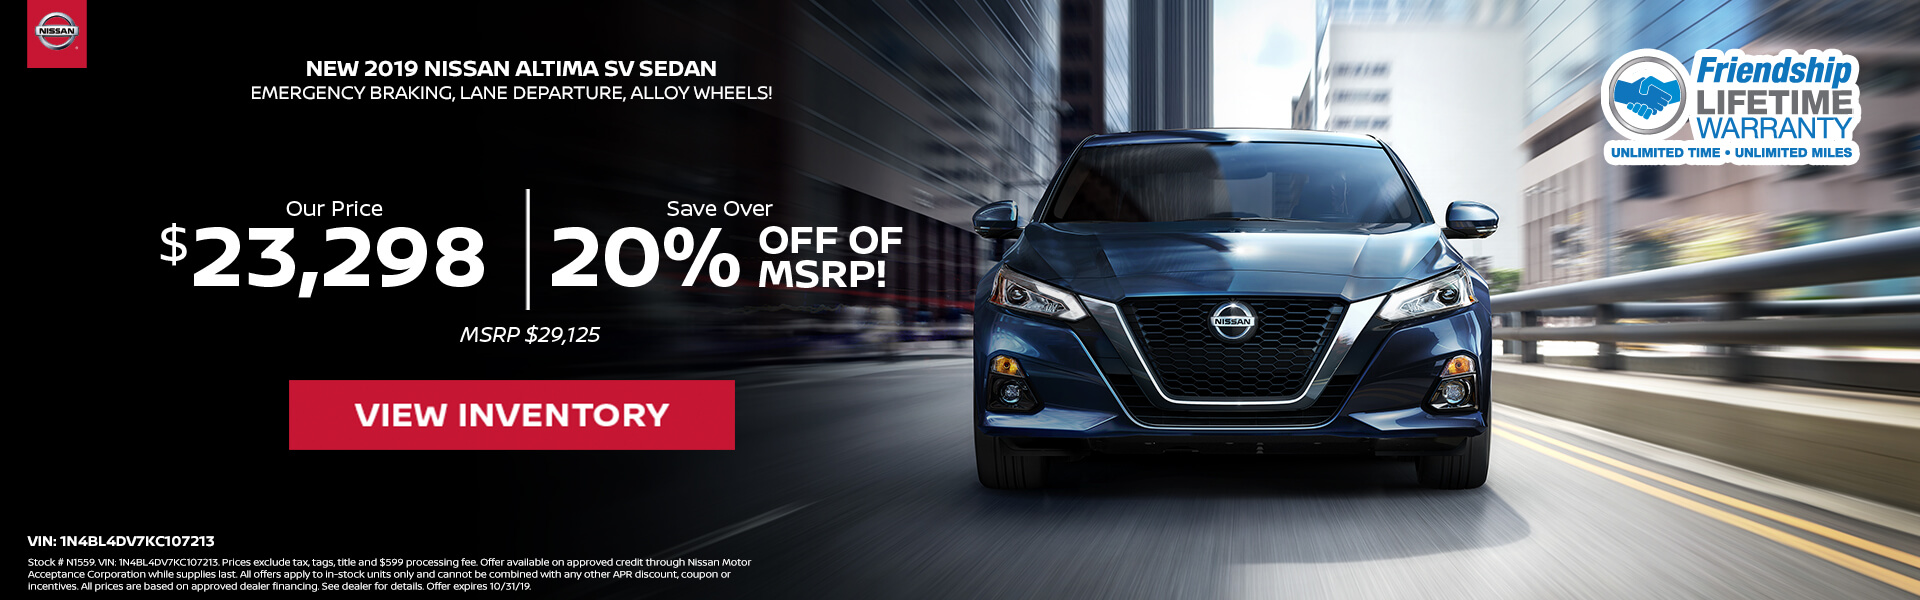 Nissan Altima $23,298 Purchase